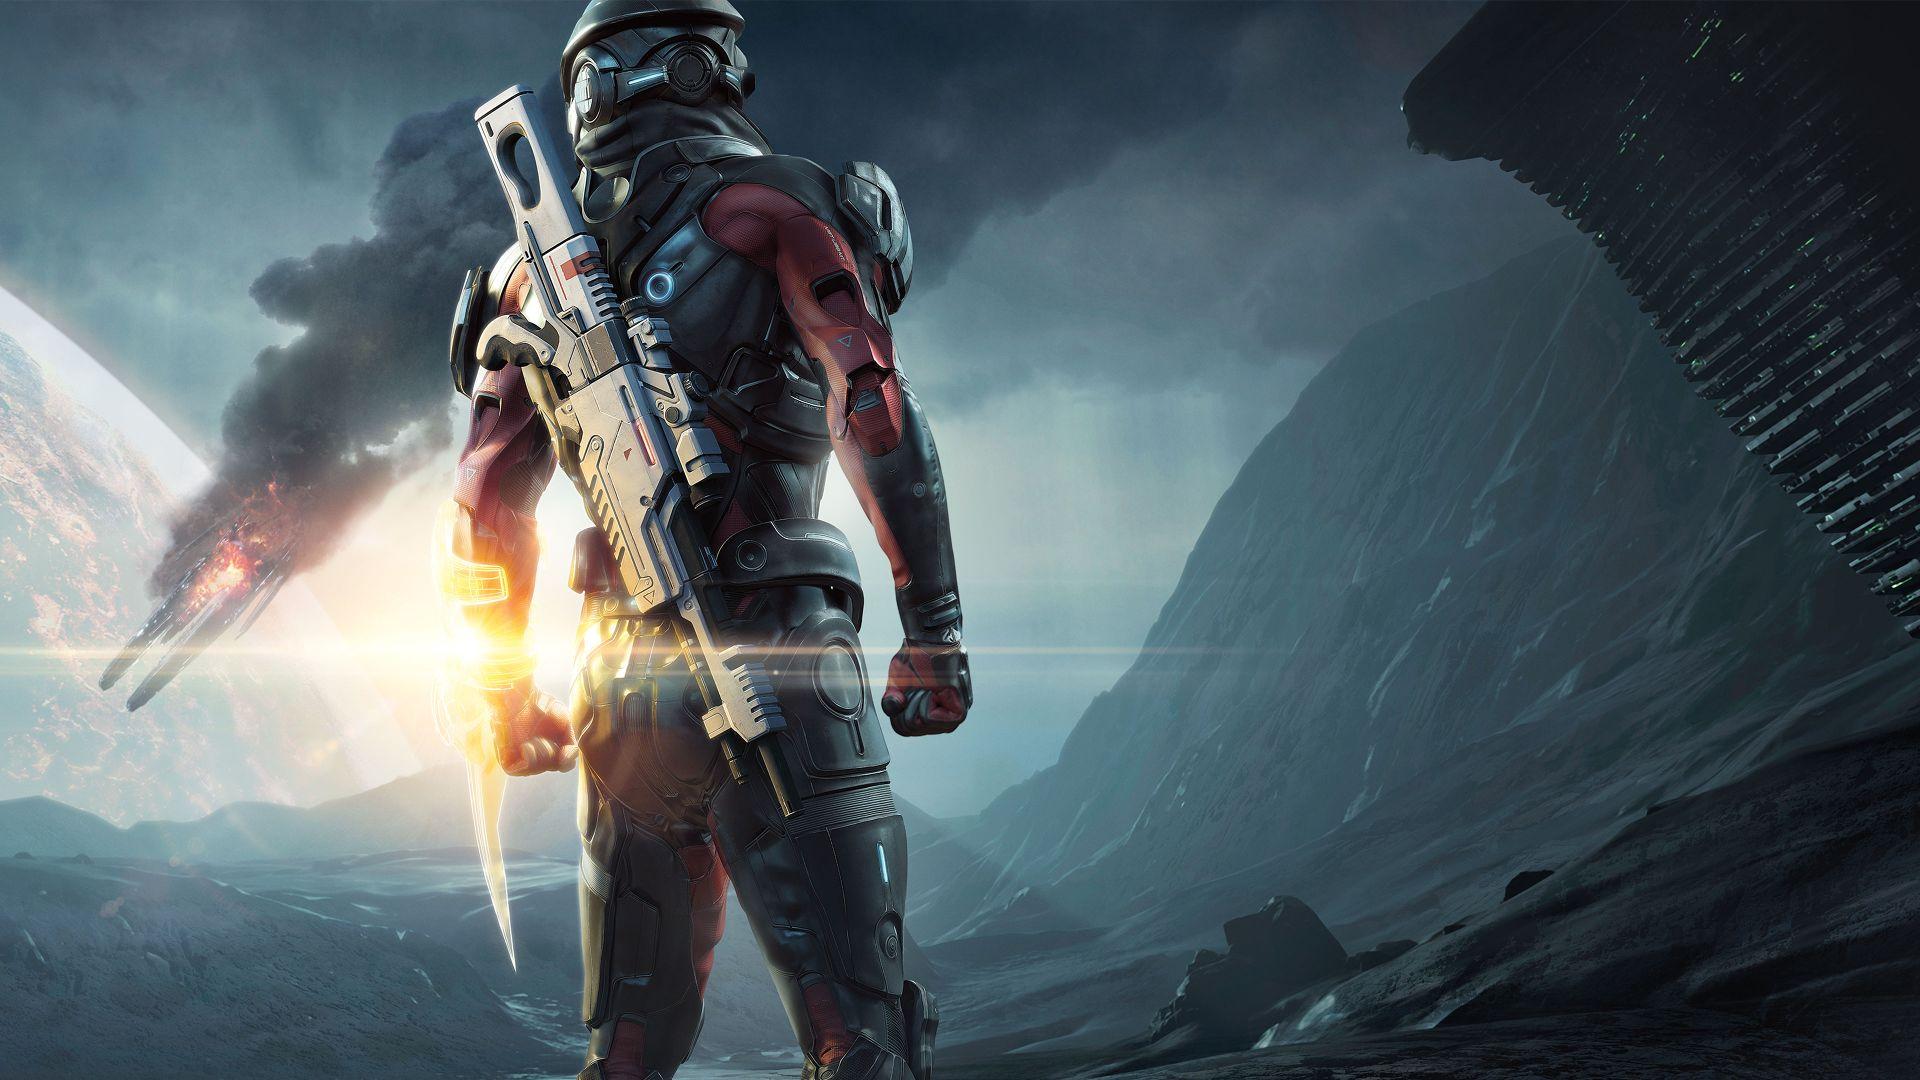 Nye Mass Effect kan spilles i 10 timer fra 16. mars om man betaler for EA Access.